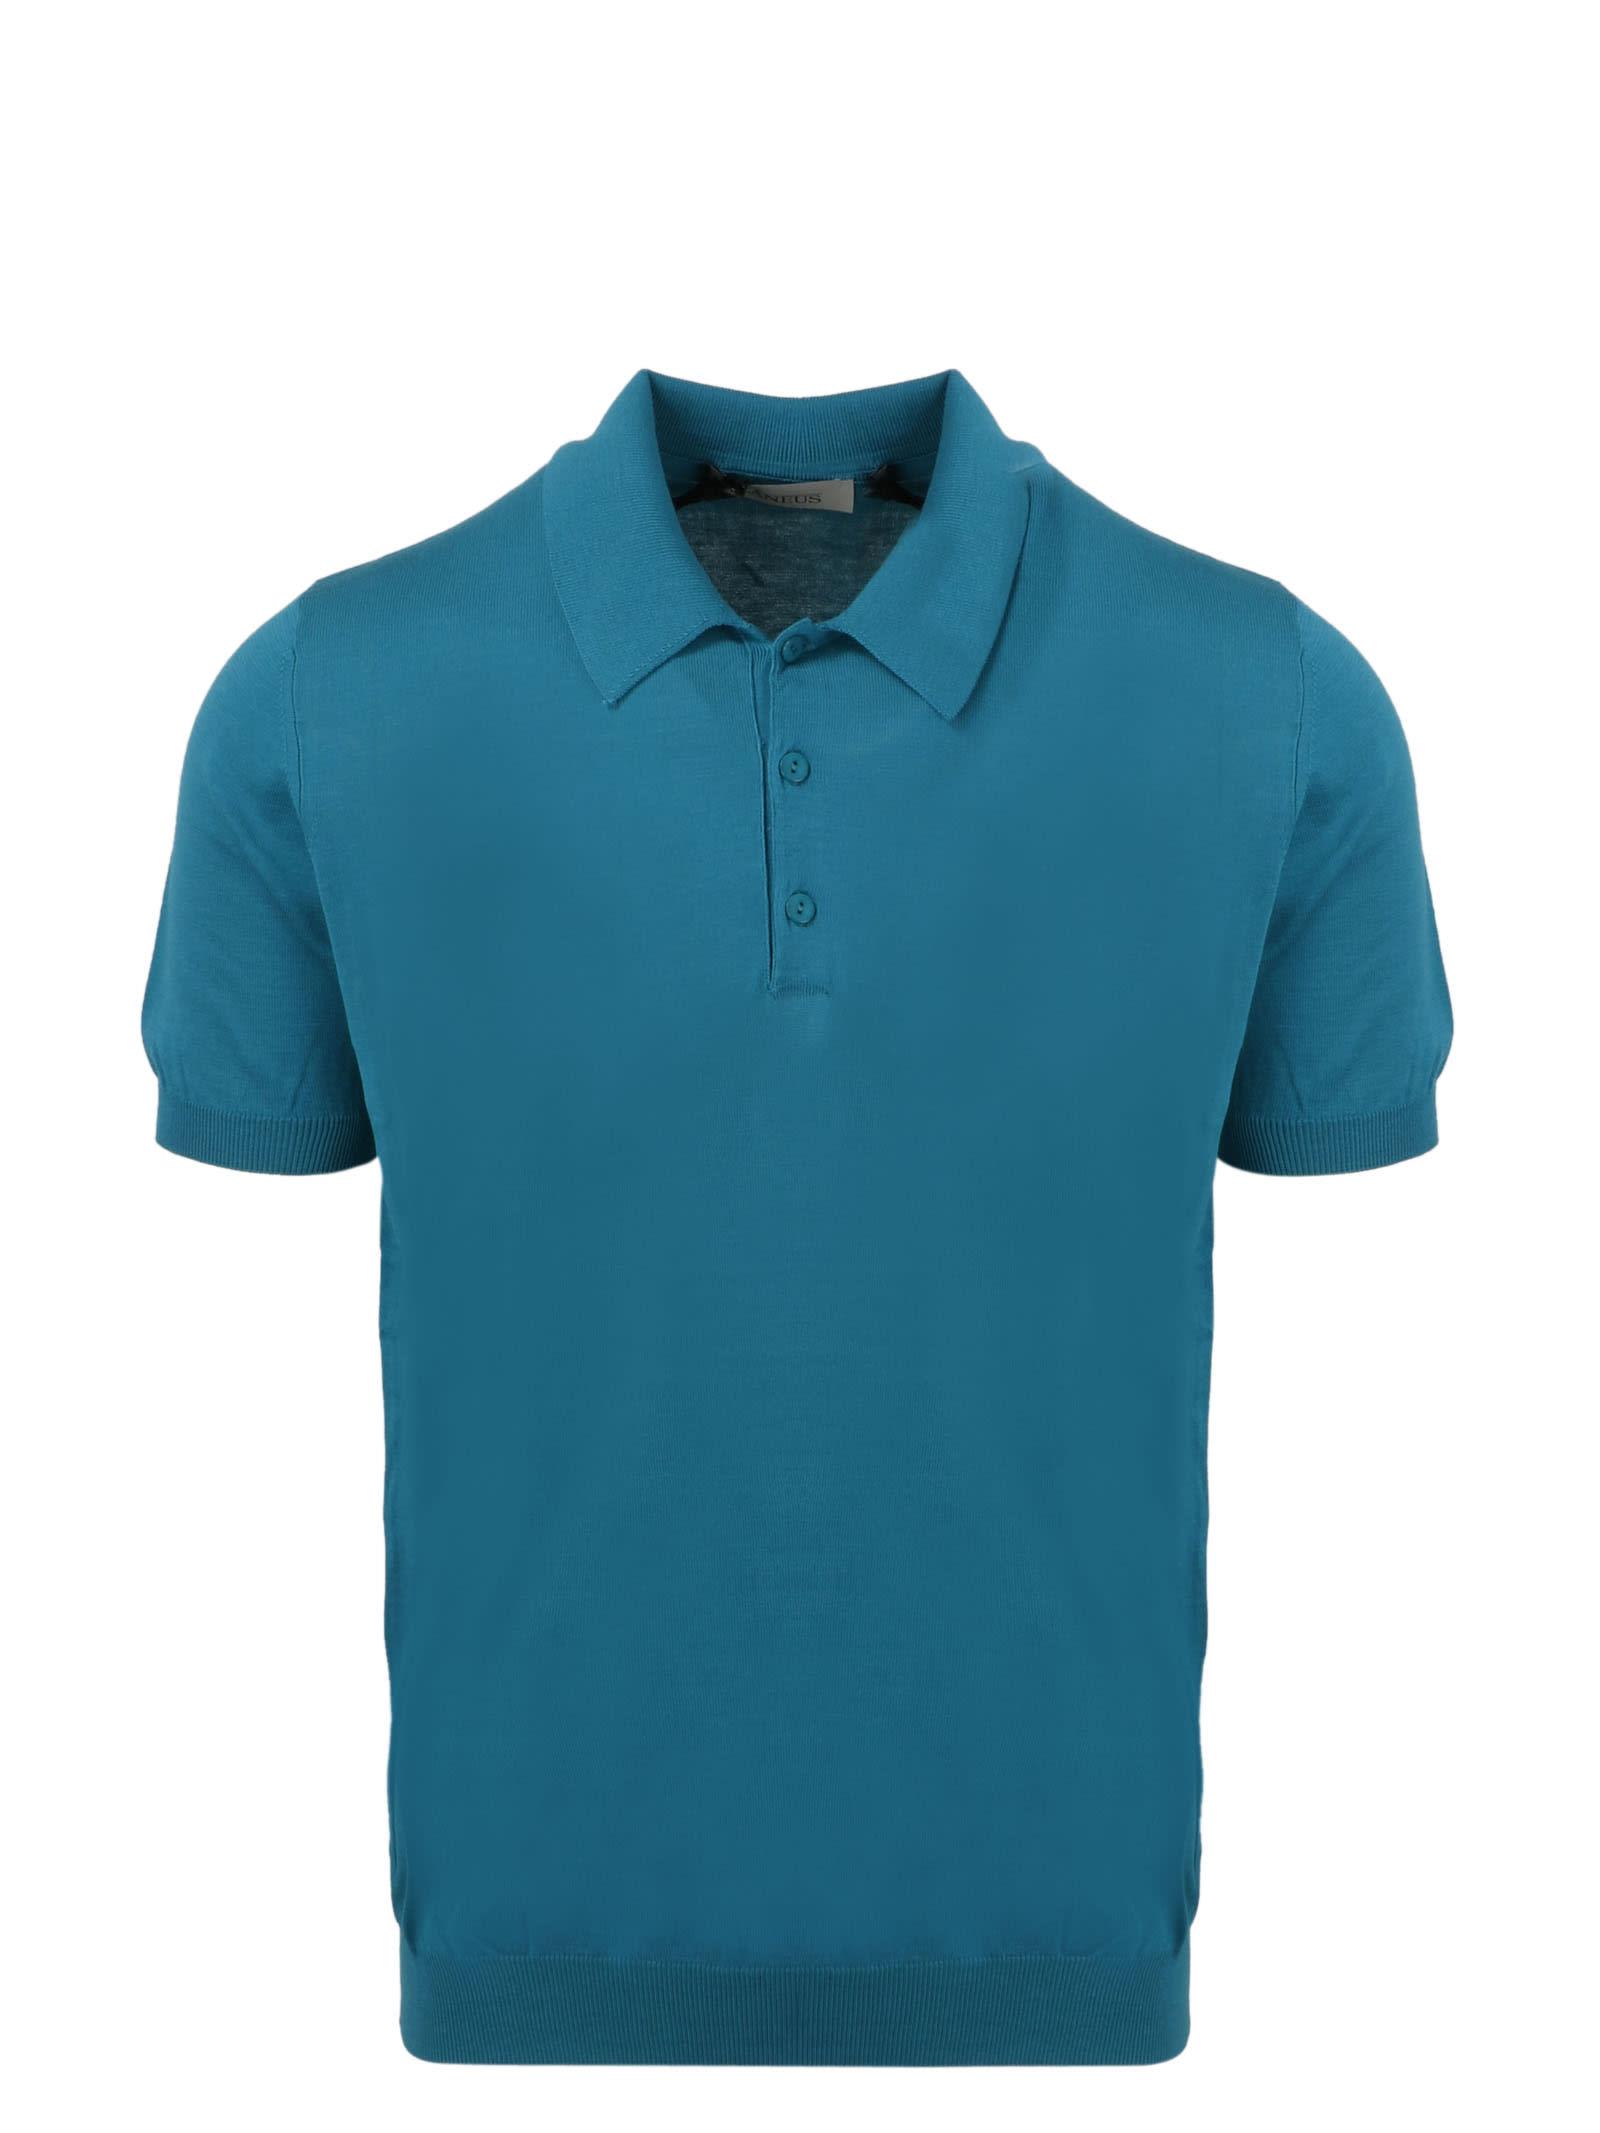 Laneus Short Sleeve Knit Polo